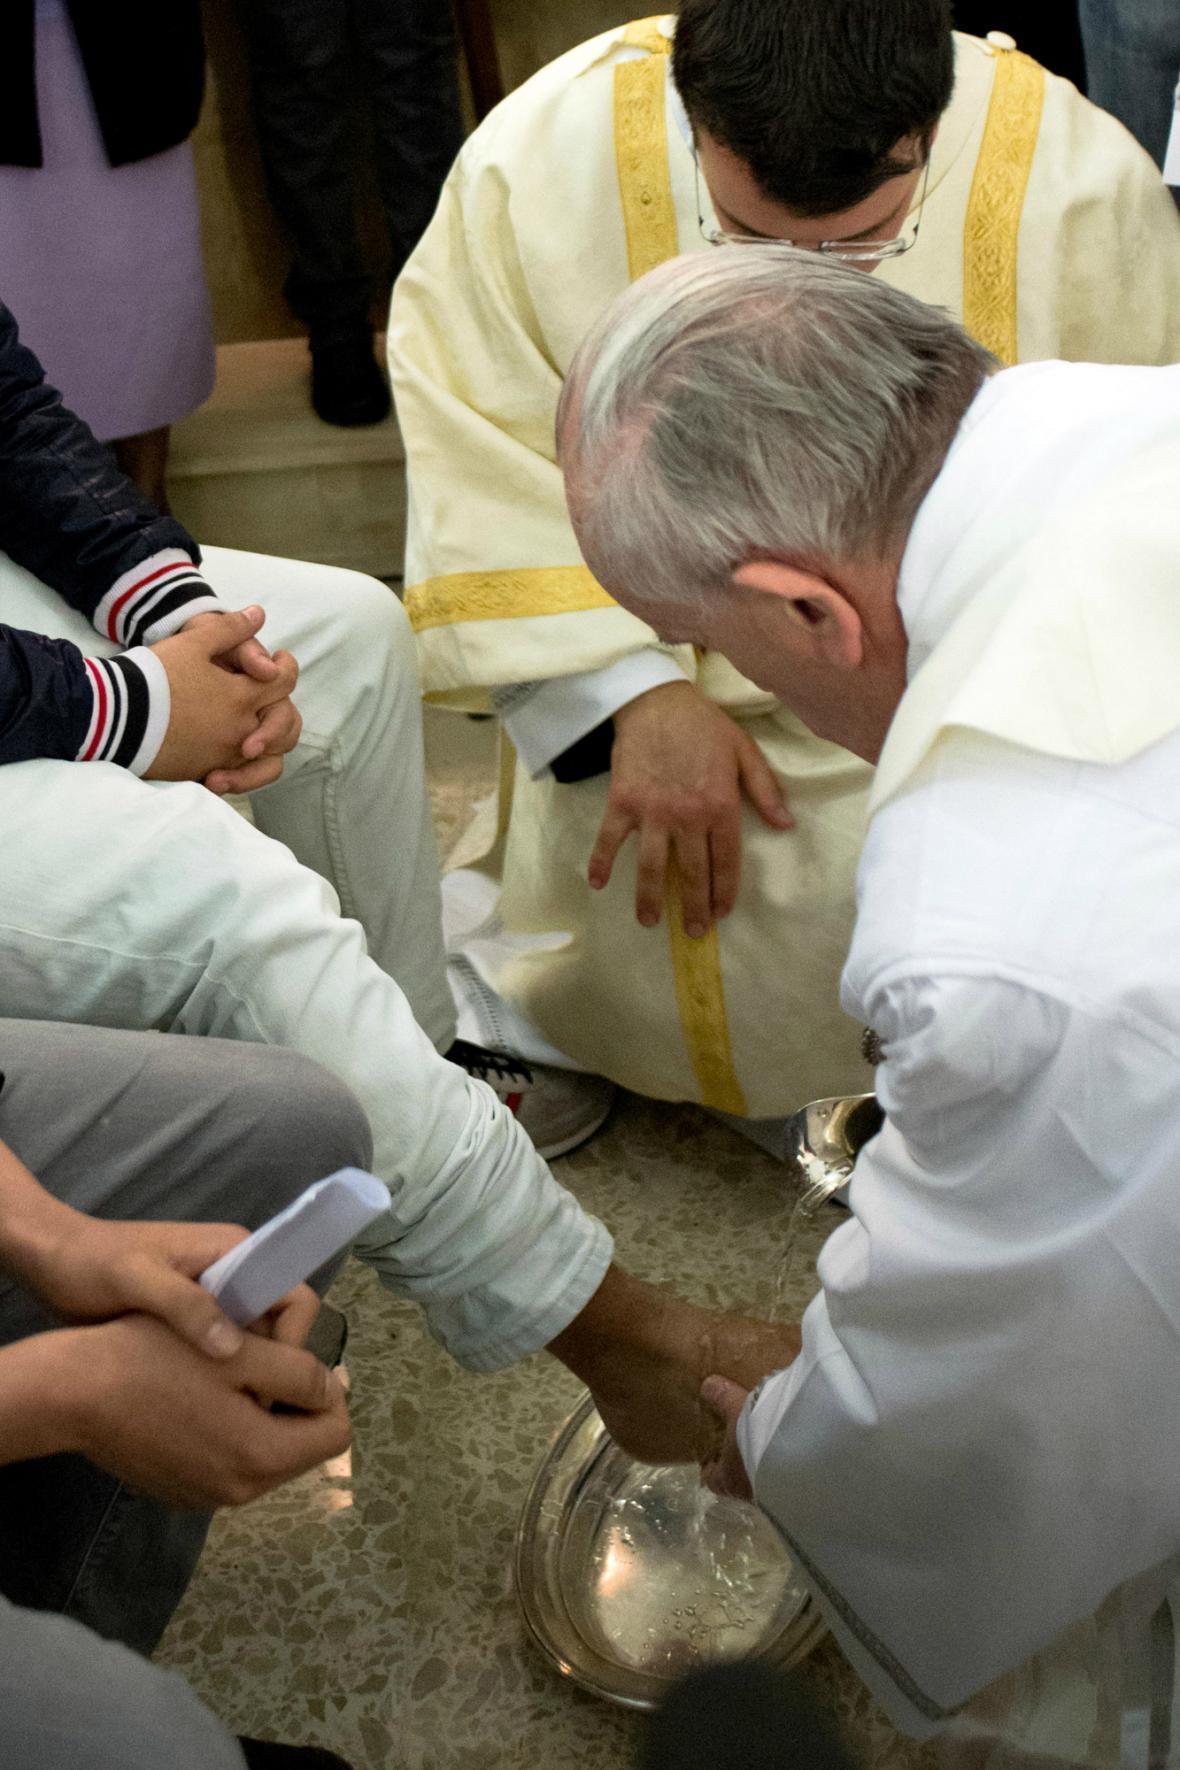 Papež umyl nohy mladistvým delikventům